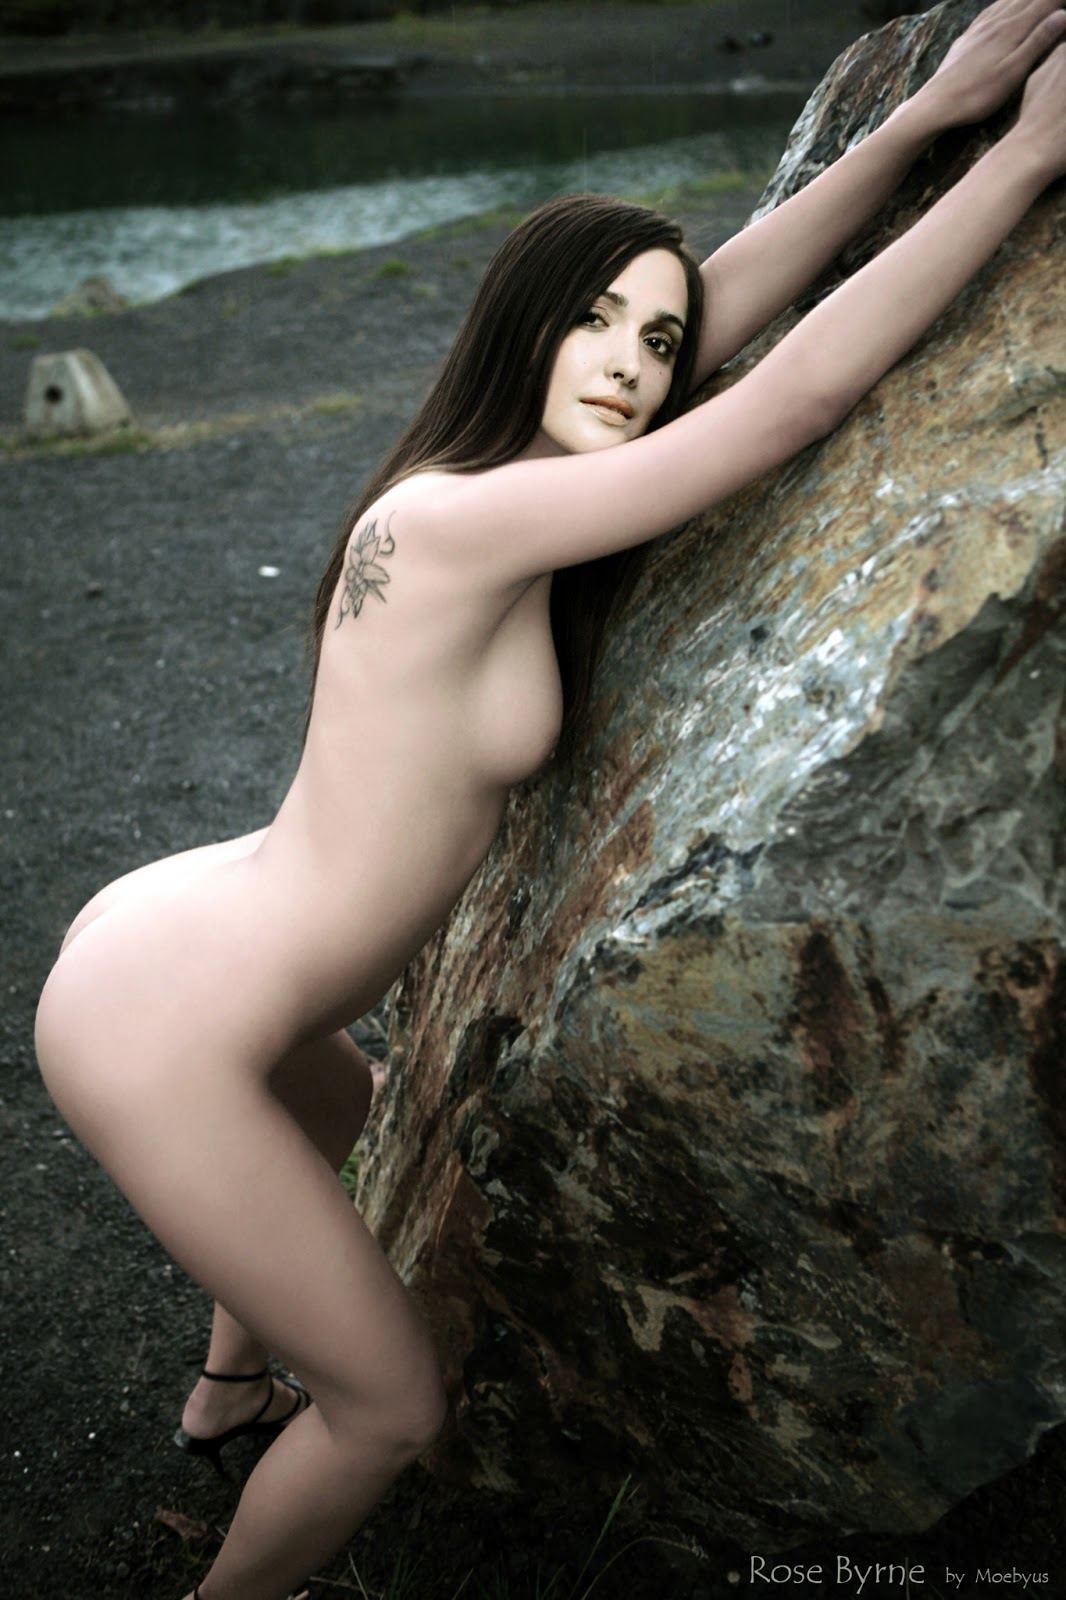 nude sexy playboy bunny image